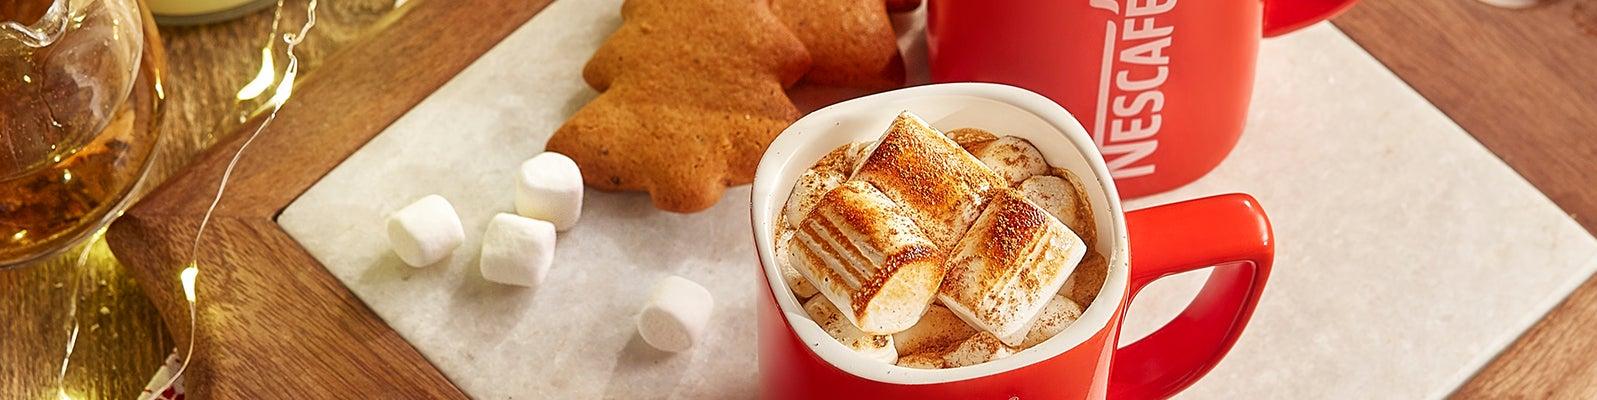 Nescafe Ginger MAllow